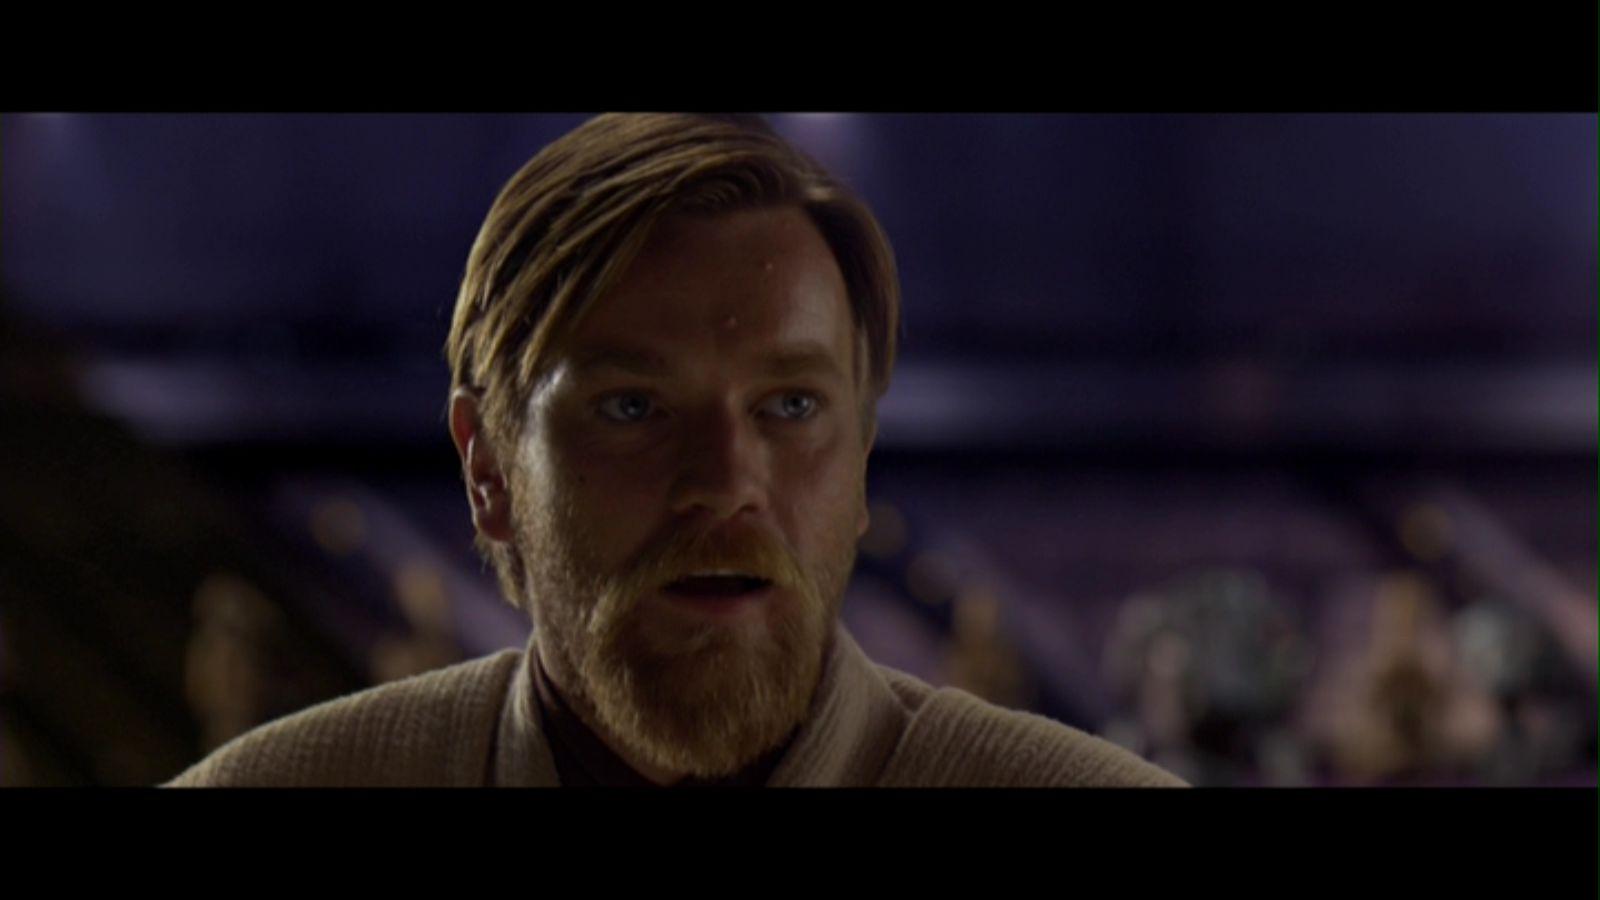 Obi Wan Kenobi Revenge Of The Sith Obi Wan Kenobi Image 23983713 Fanpop